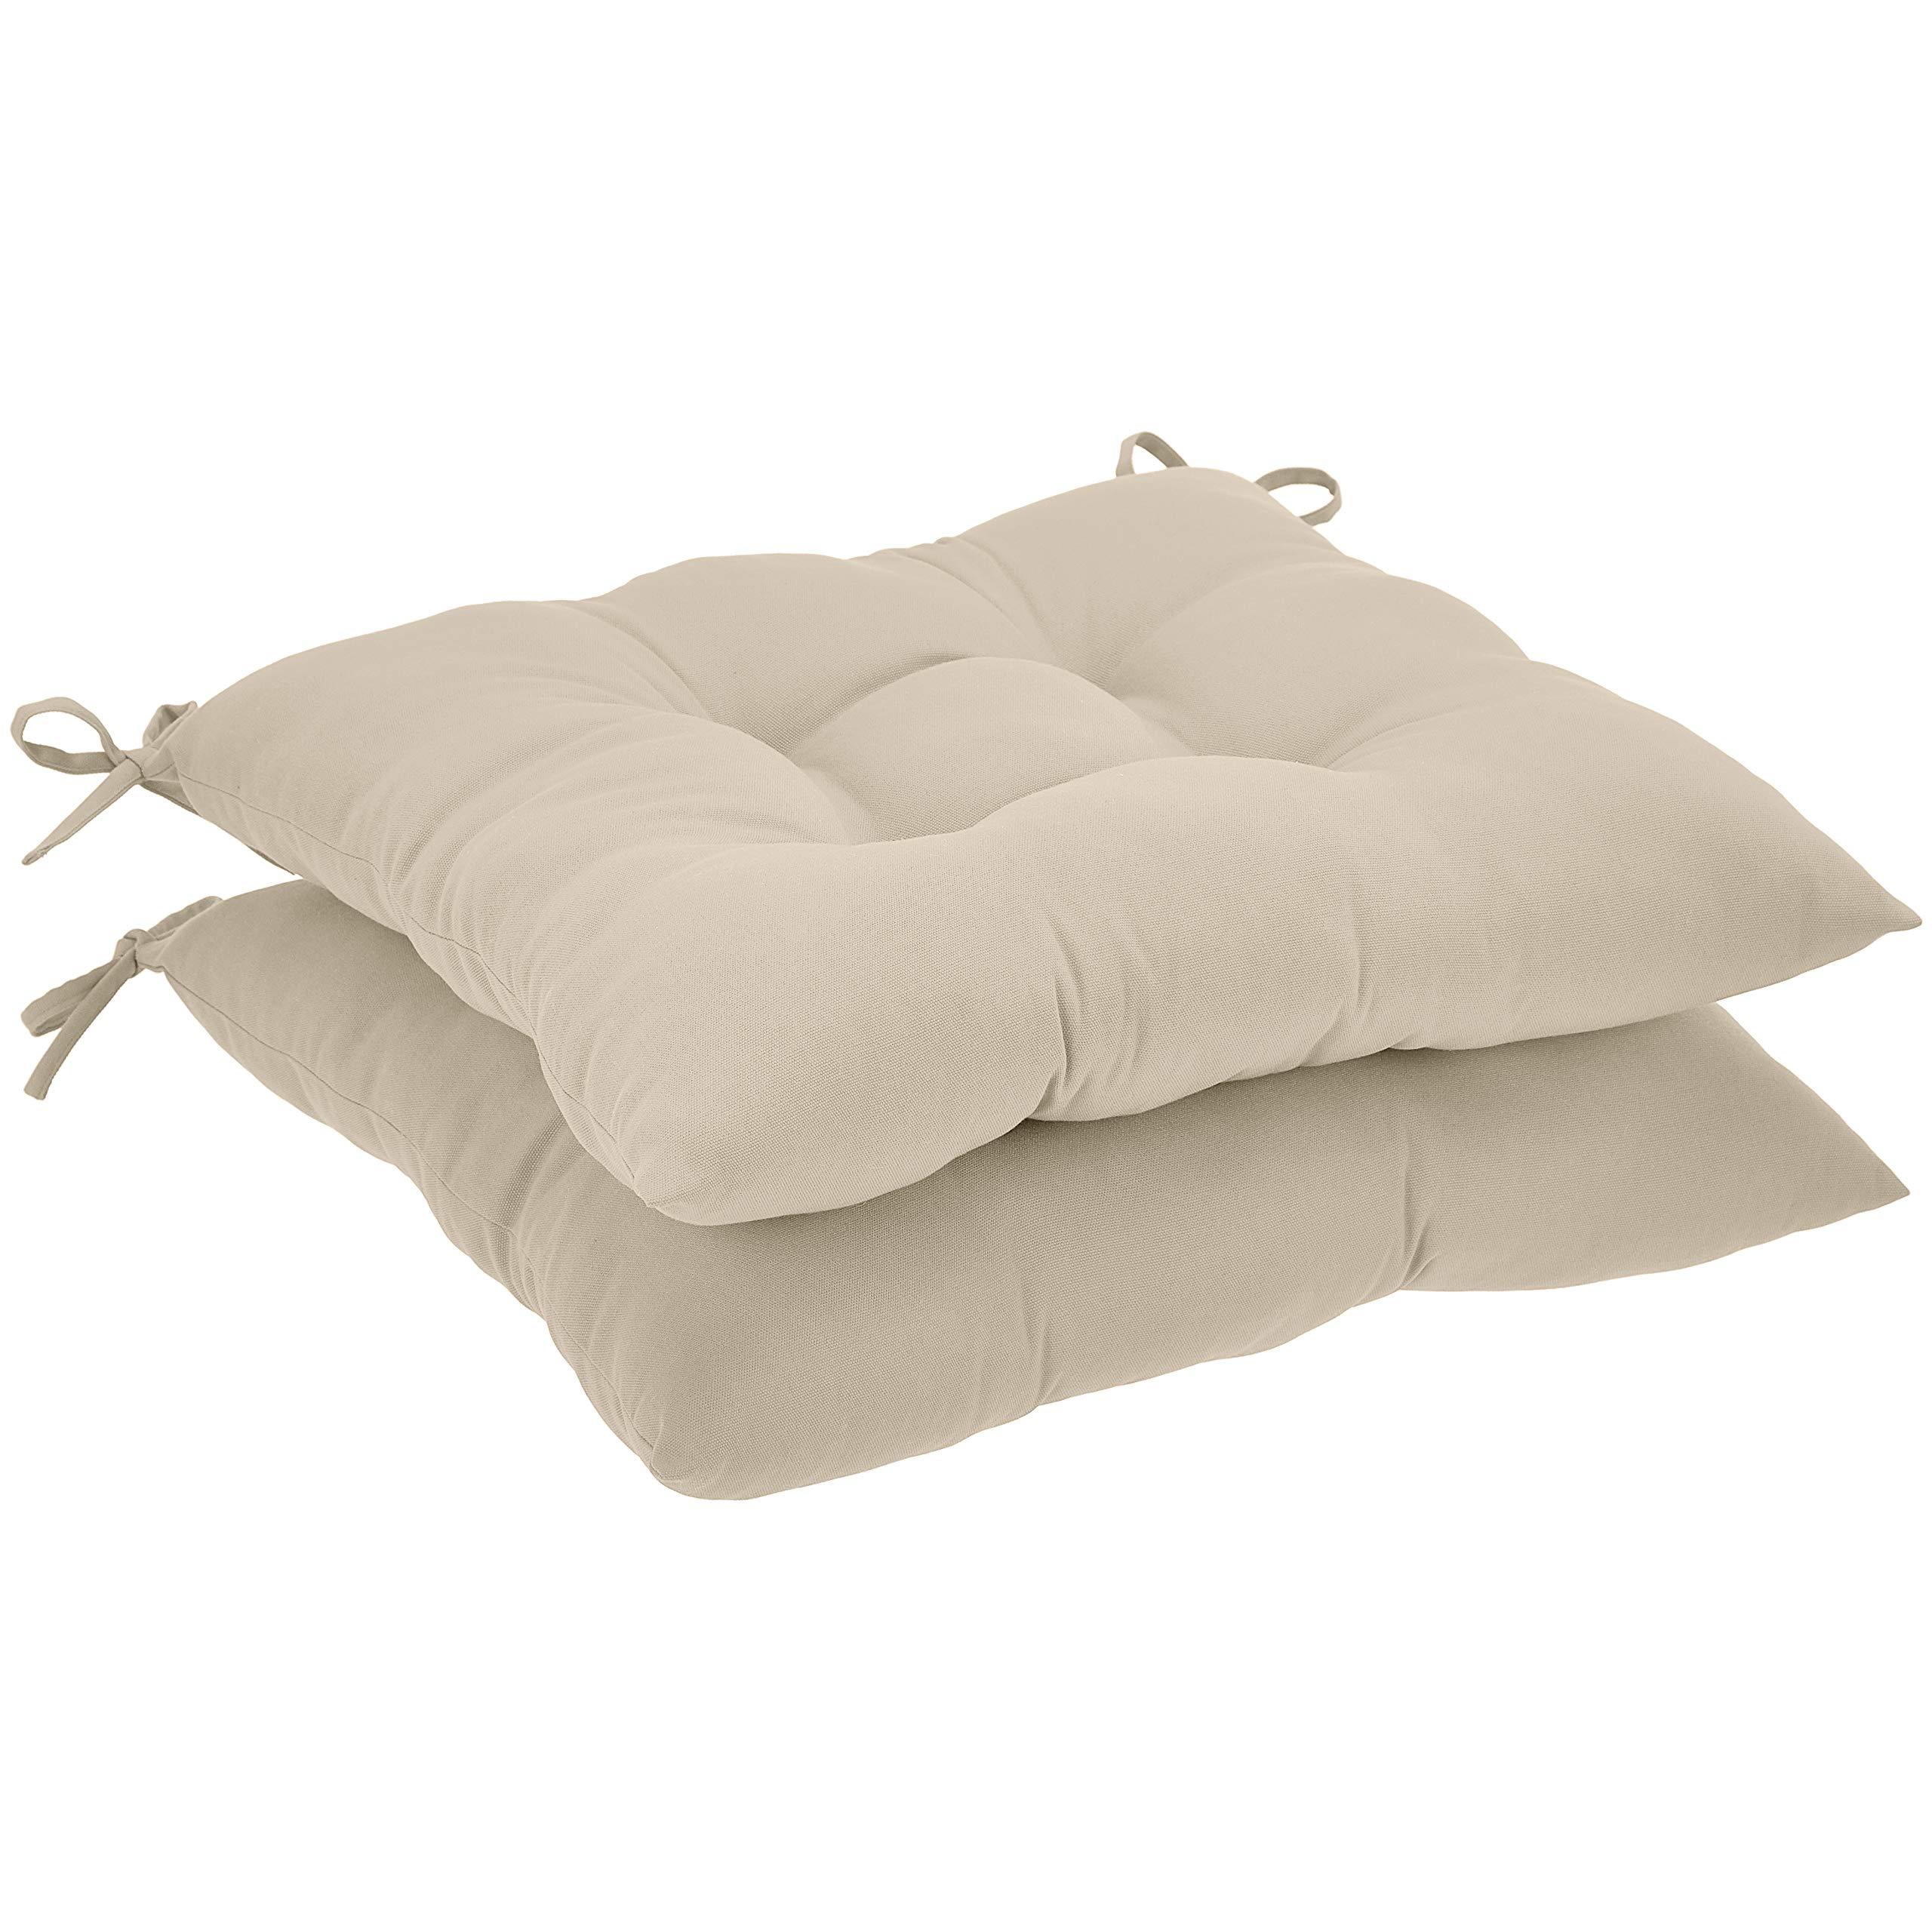 AmazonBasics Tufted Outdoor Square Seat Patio Cushion - Pack of 2, Khaki by AmazonBasics